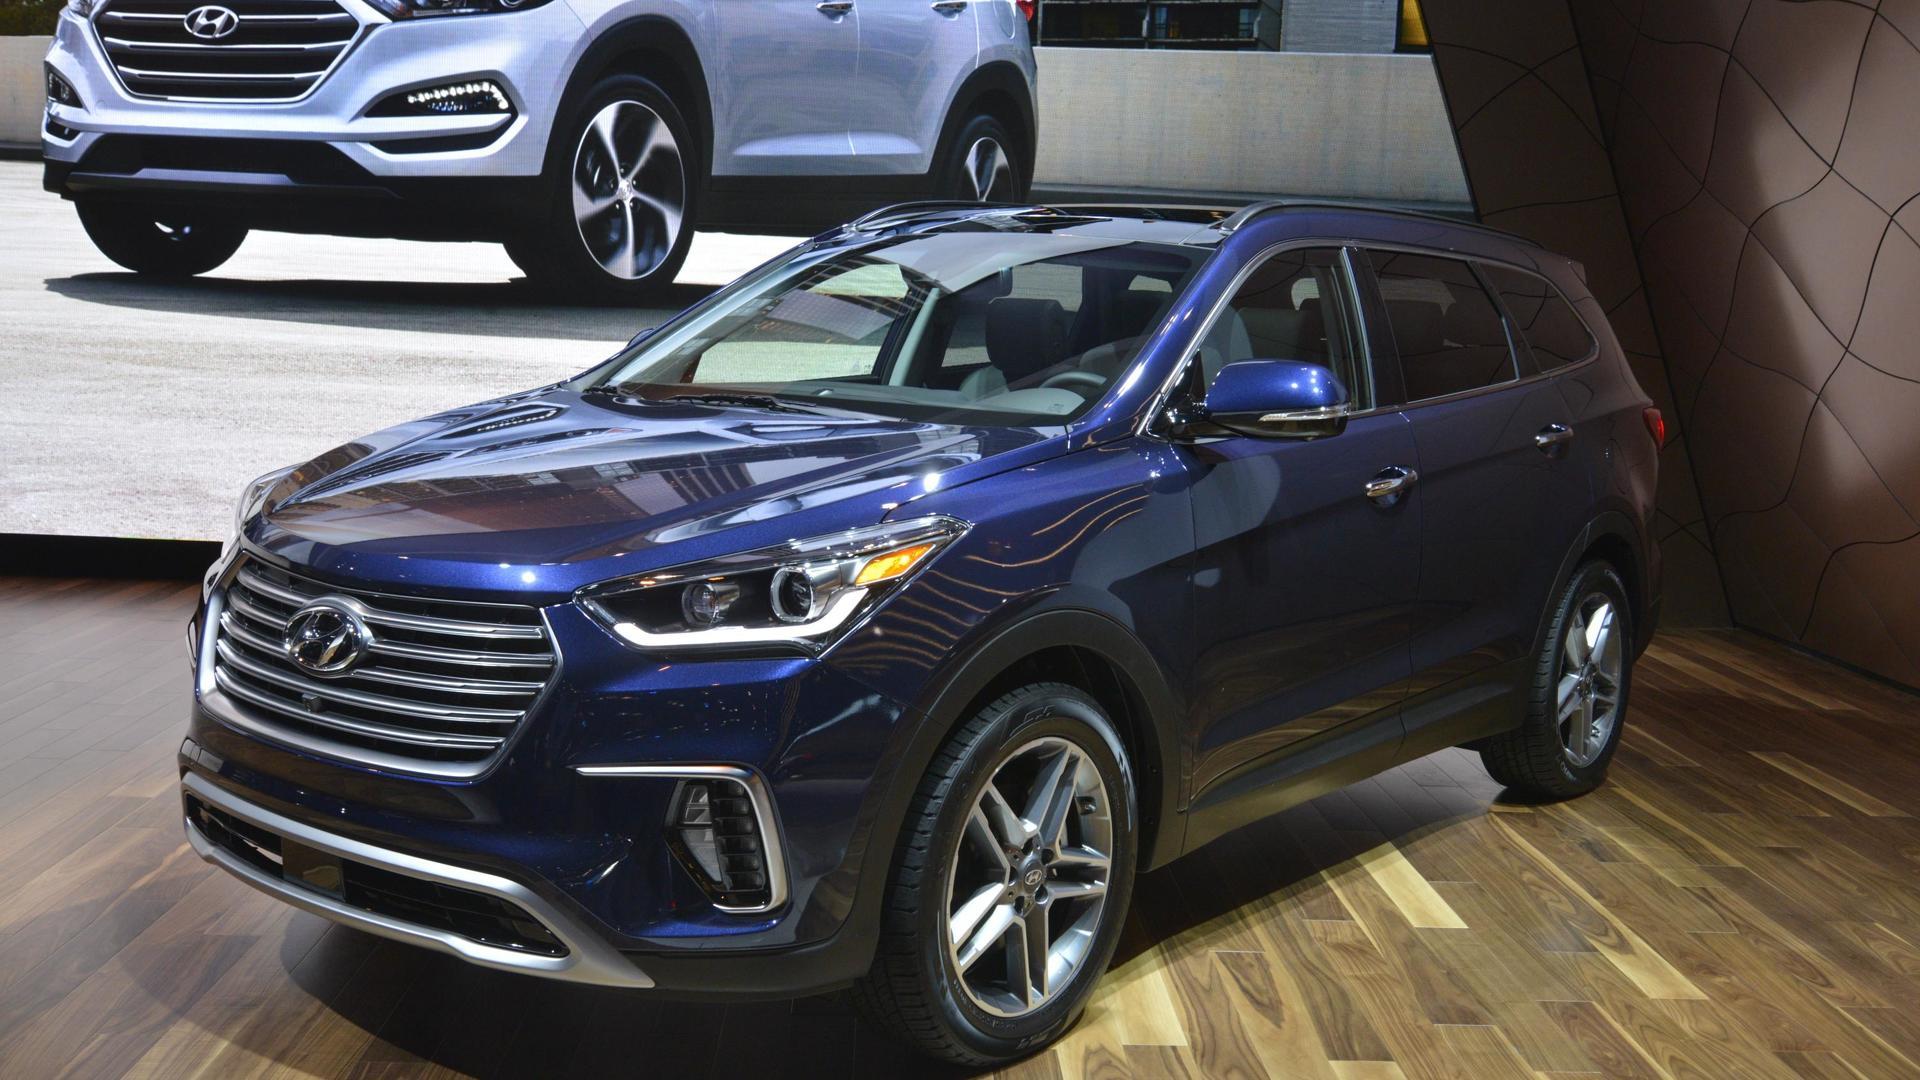 2017 Hyundai Santa Fe shows new face in Chicago